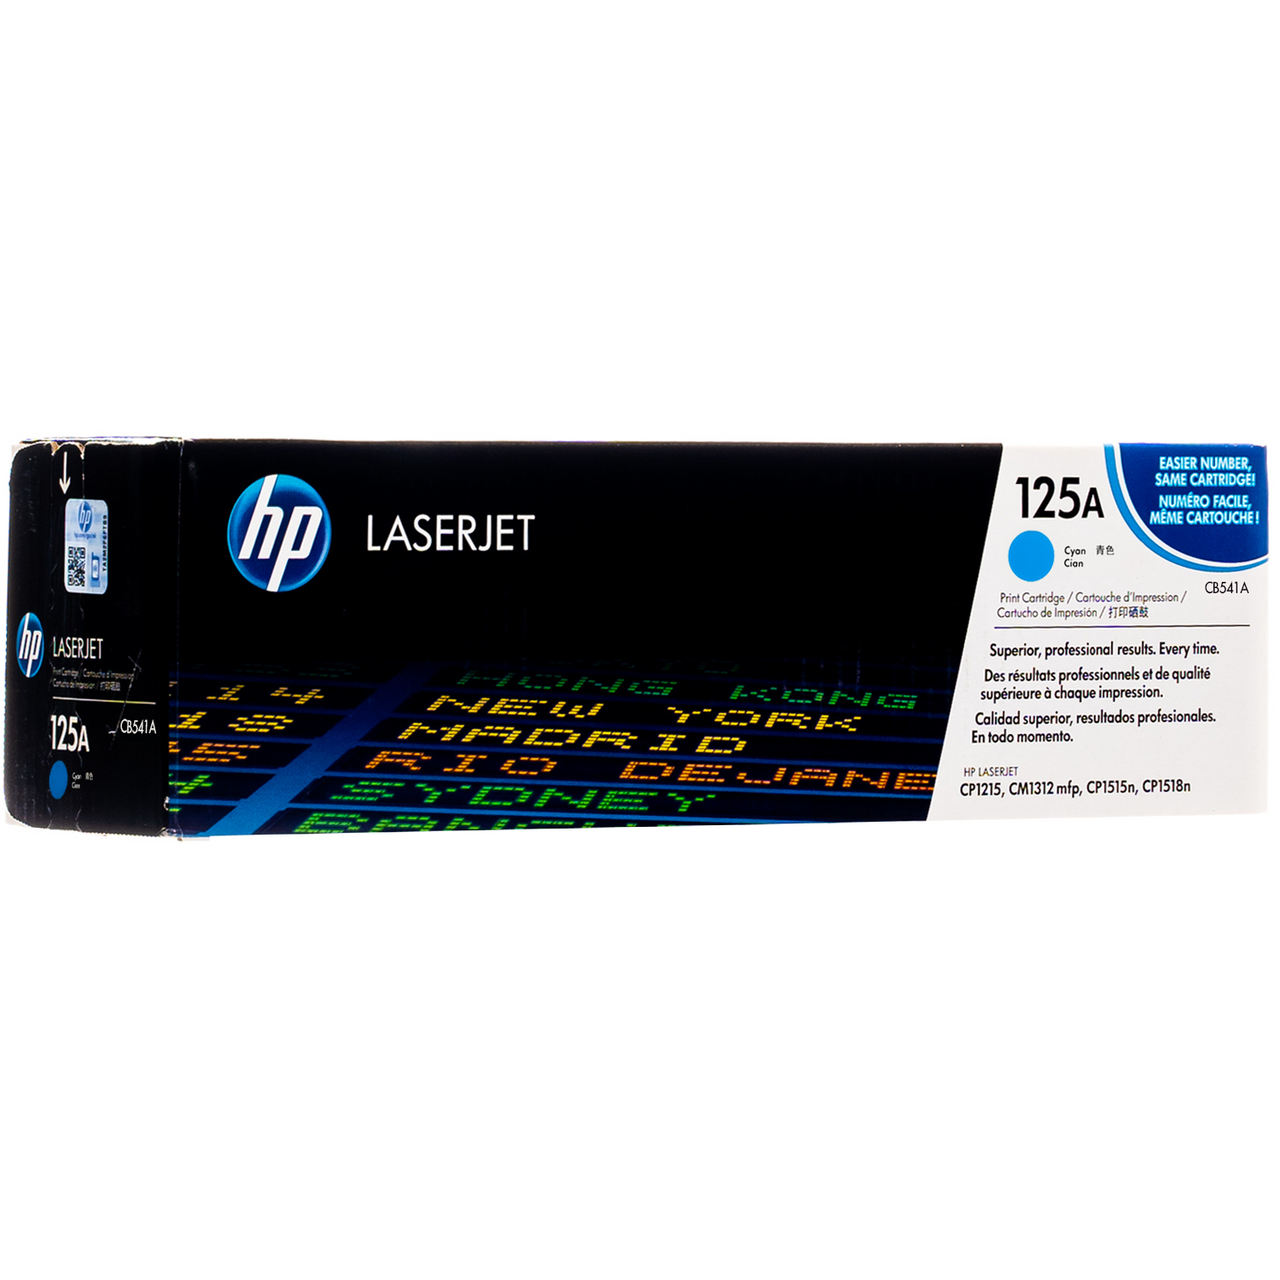 Set-of-4-HP-Genuine 125A Toner-CB540A-CB541A-CB542A-CB543A-OEM-New  Unopened